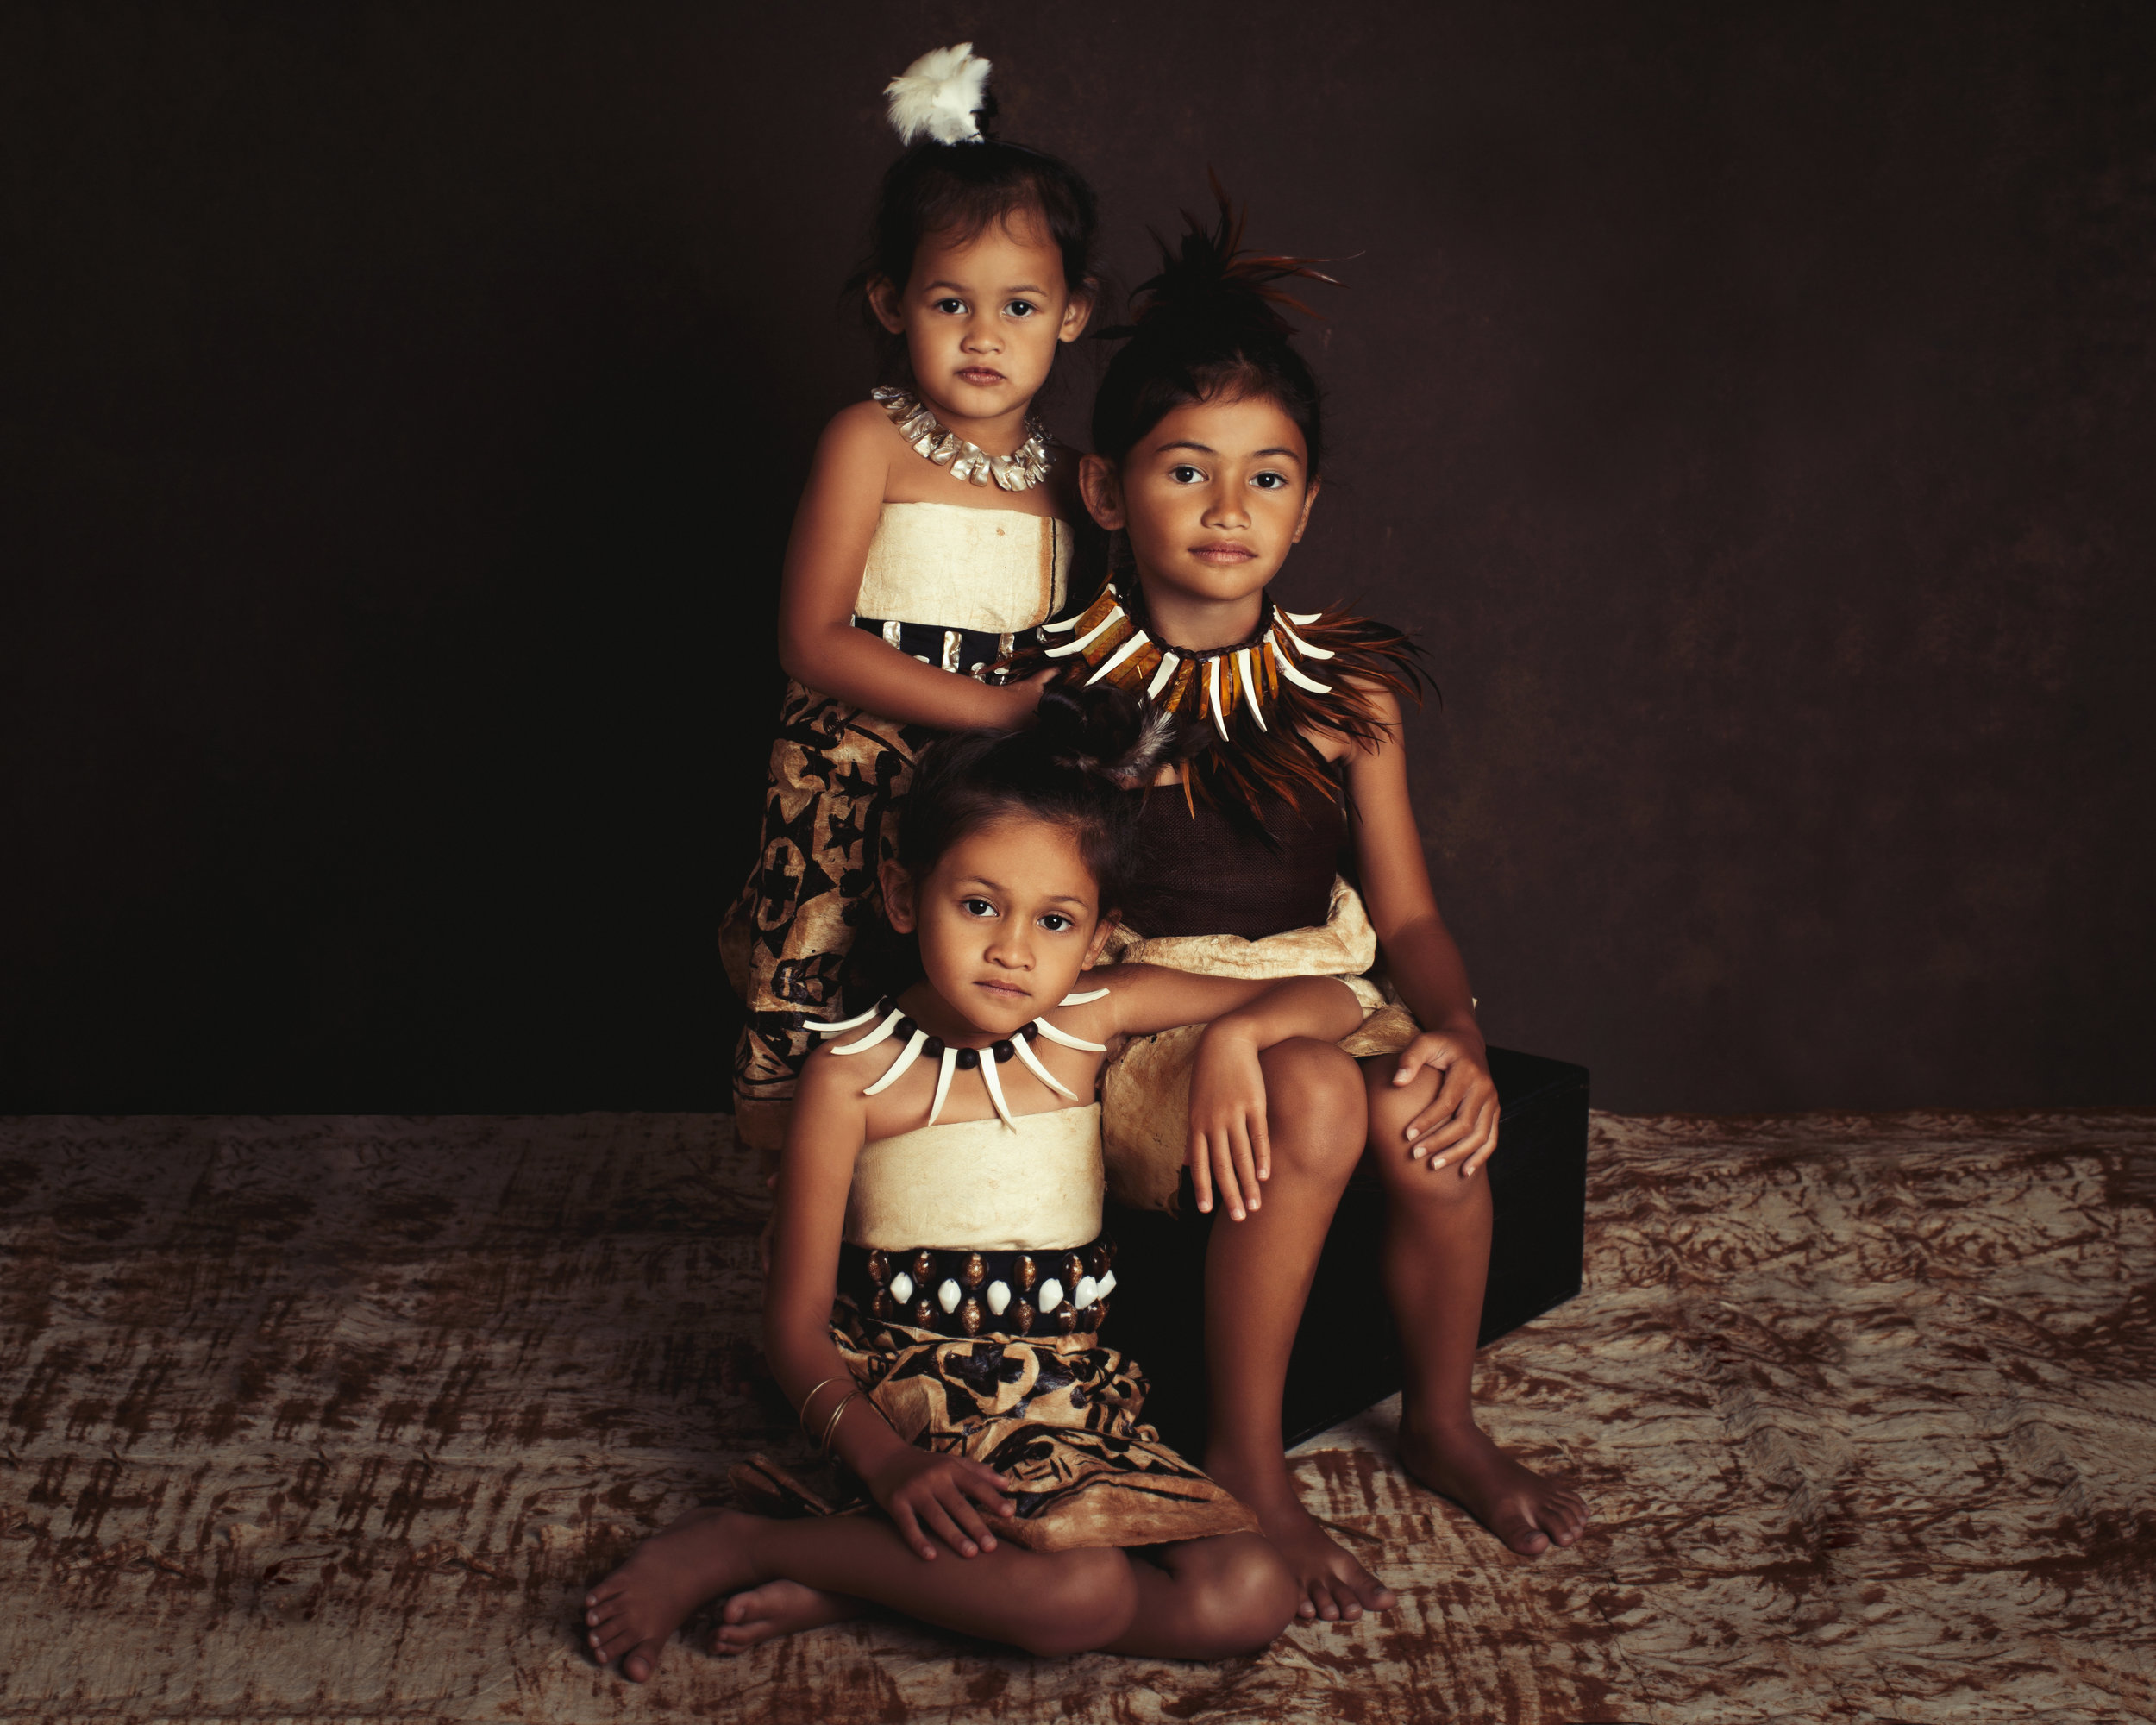 Mapuana Reed Photography - Soriah-127-FE 24x30C.jpg